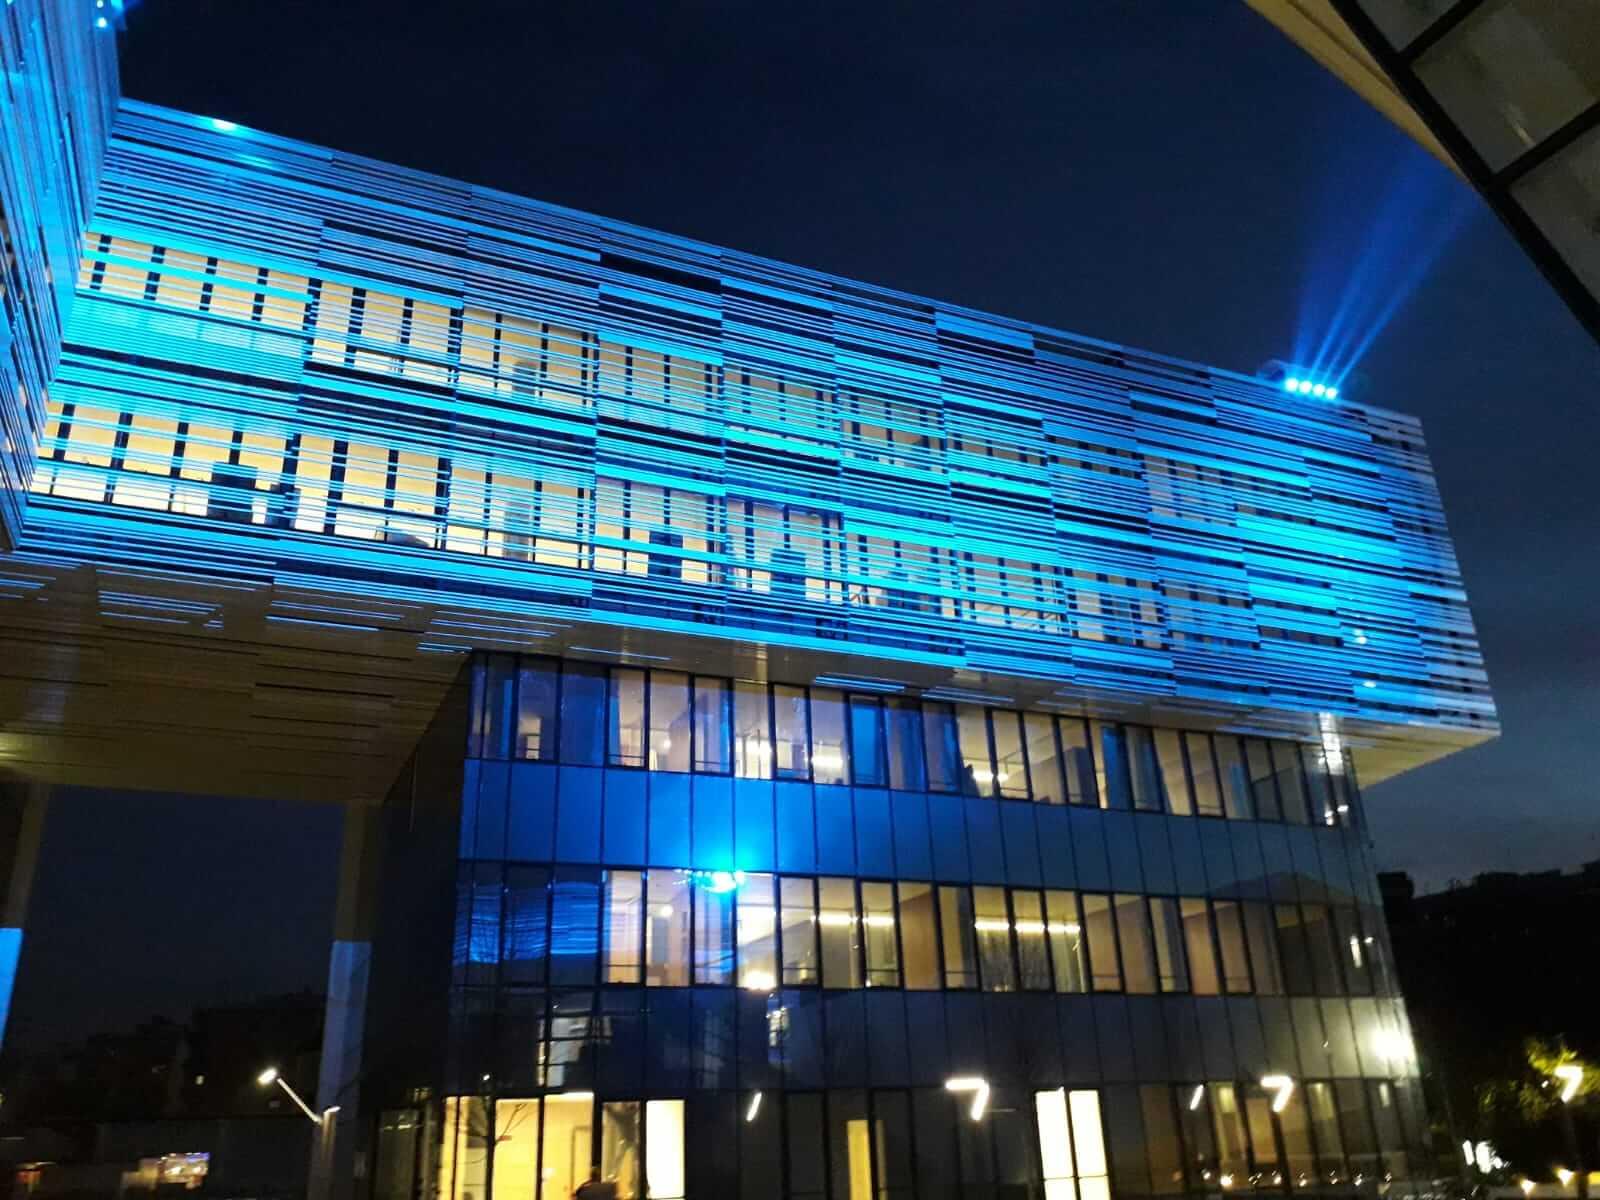 Palazzo a vetri moderno